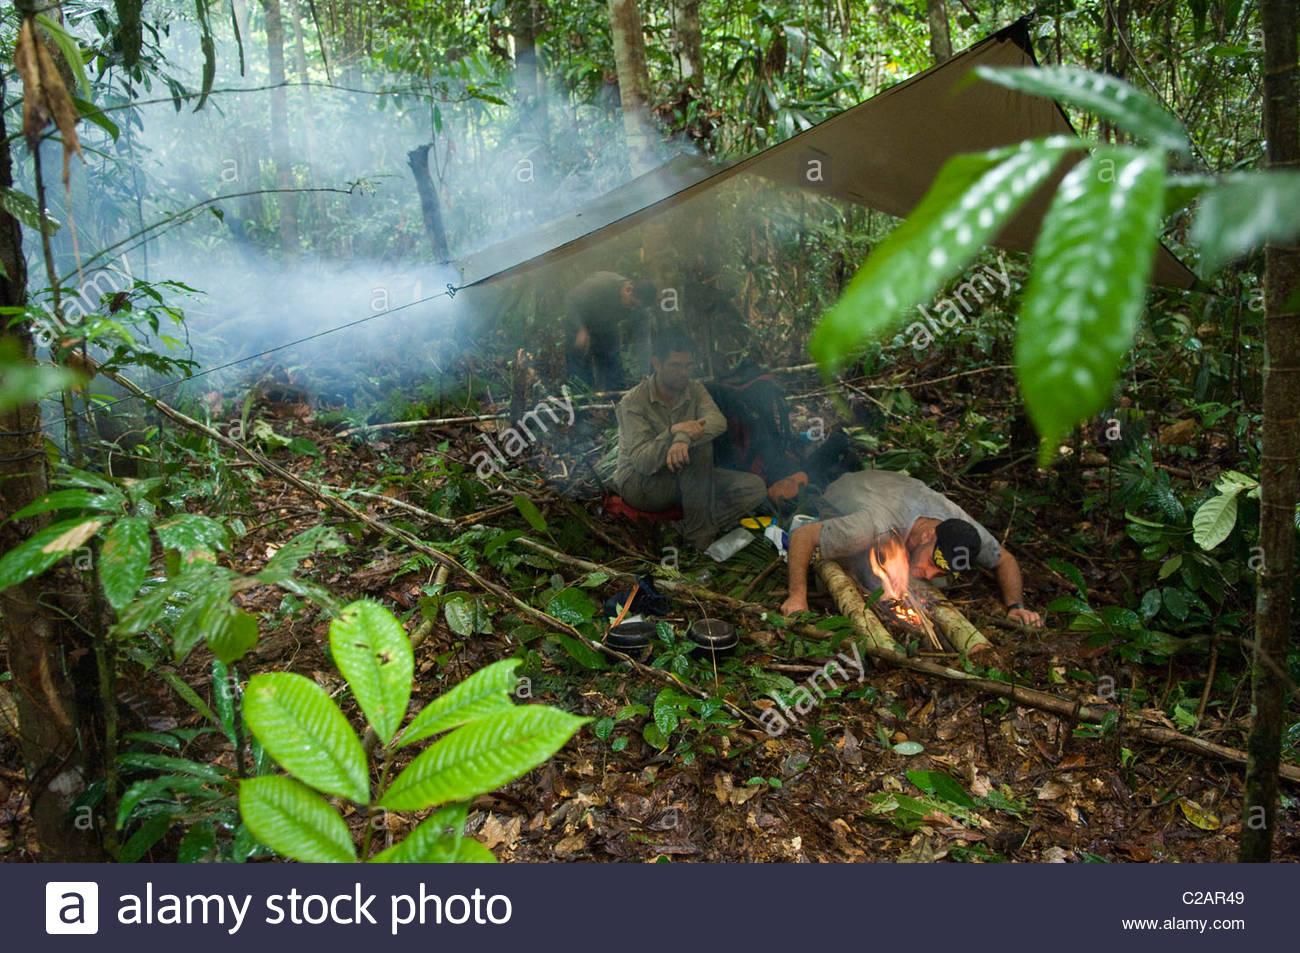 Ed Stafford at camp during his 859-day Amazon Jungle walk. - Stock Image